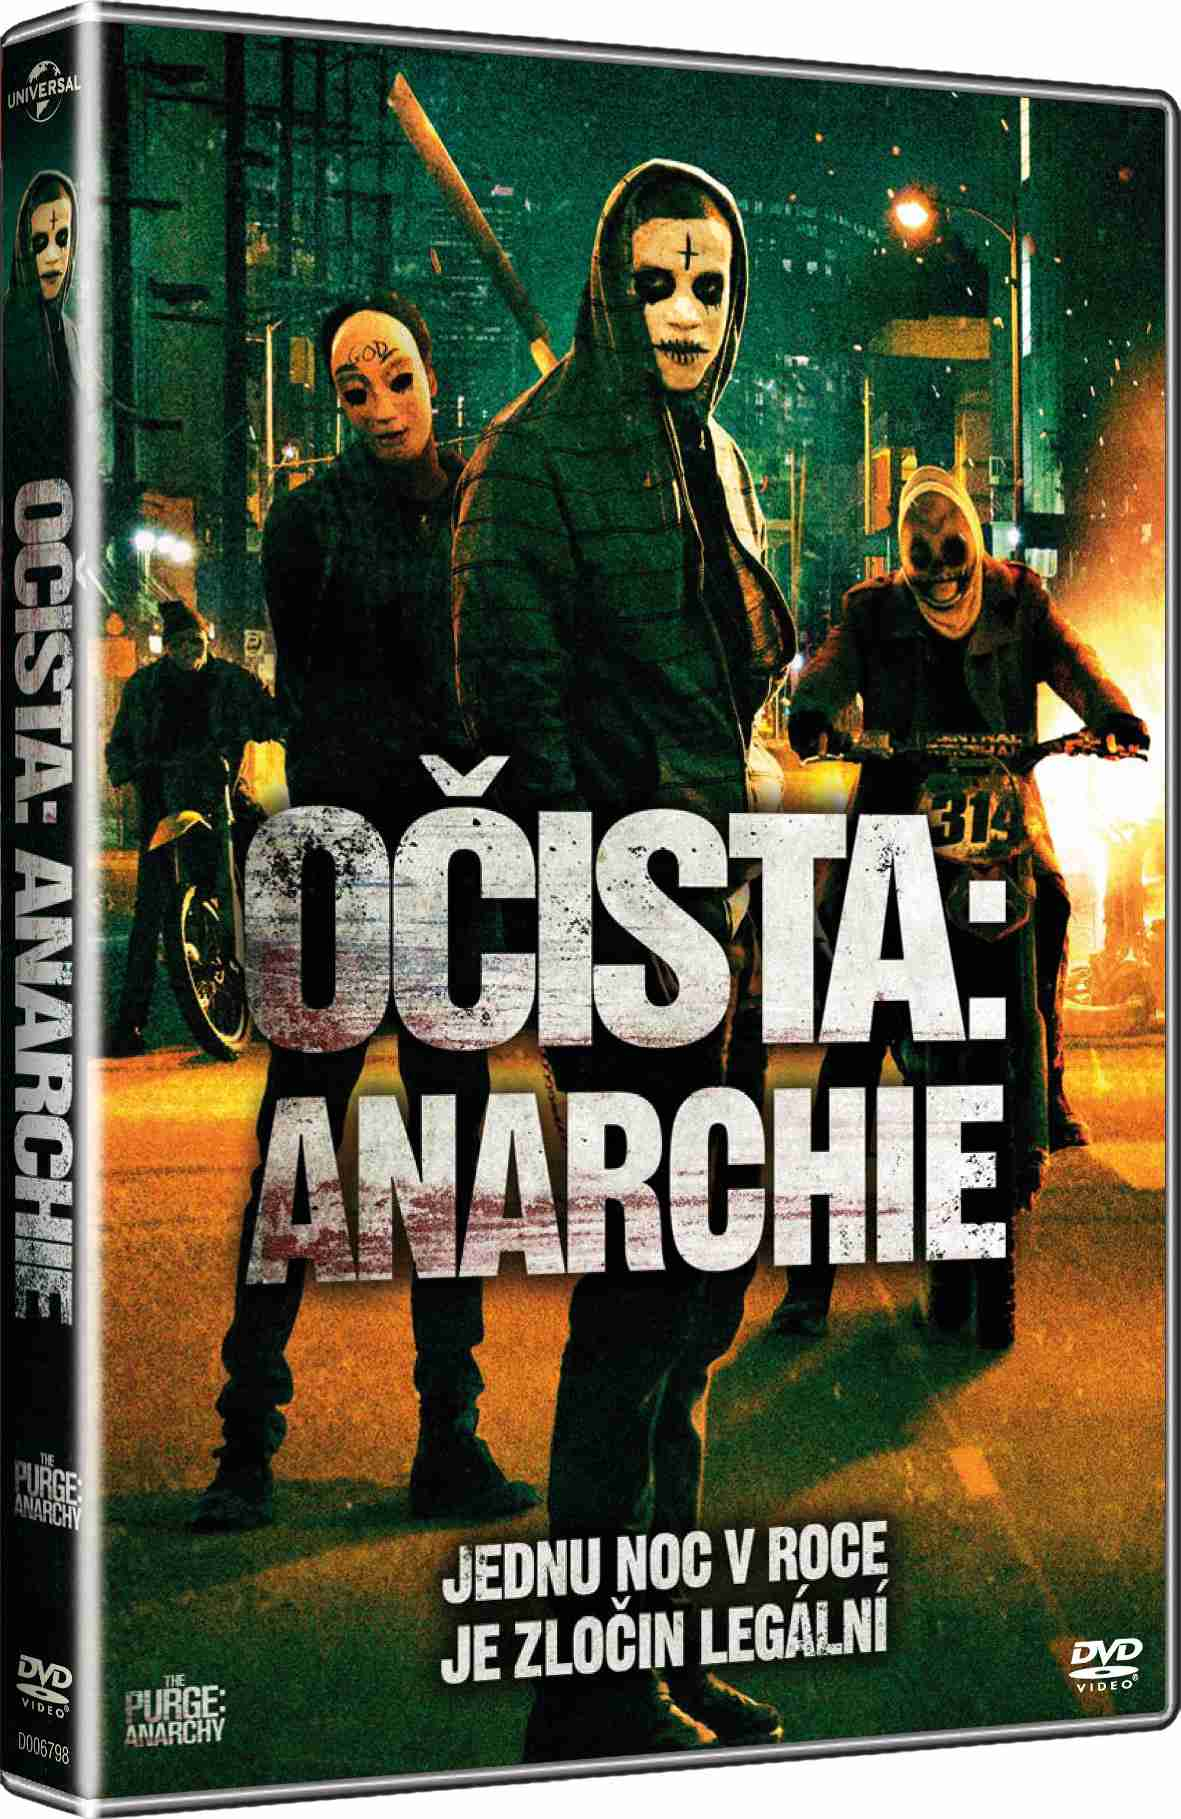 OČISTA: ANARCHIE - DVD